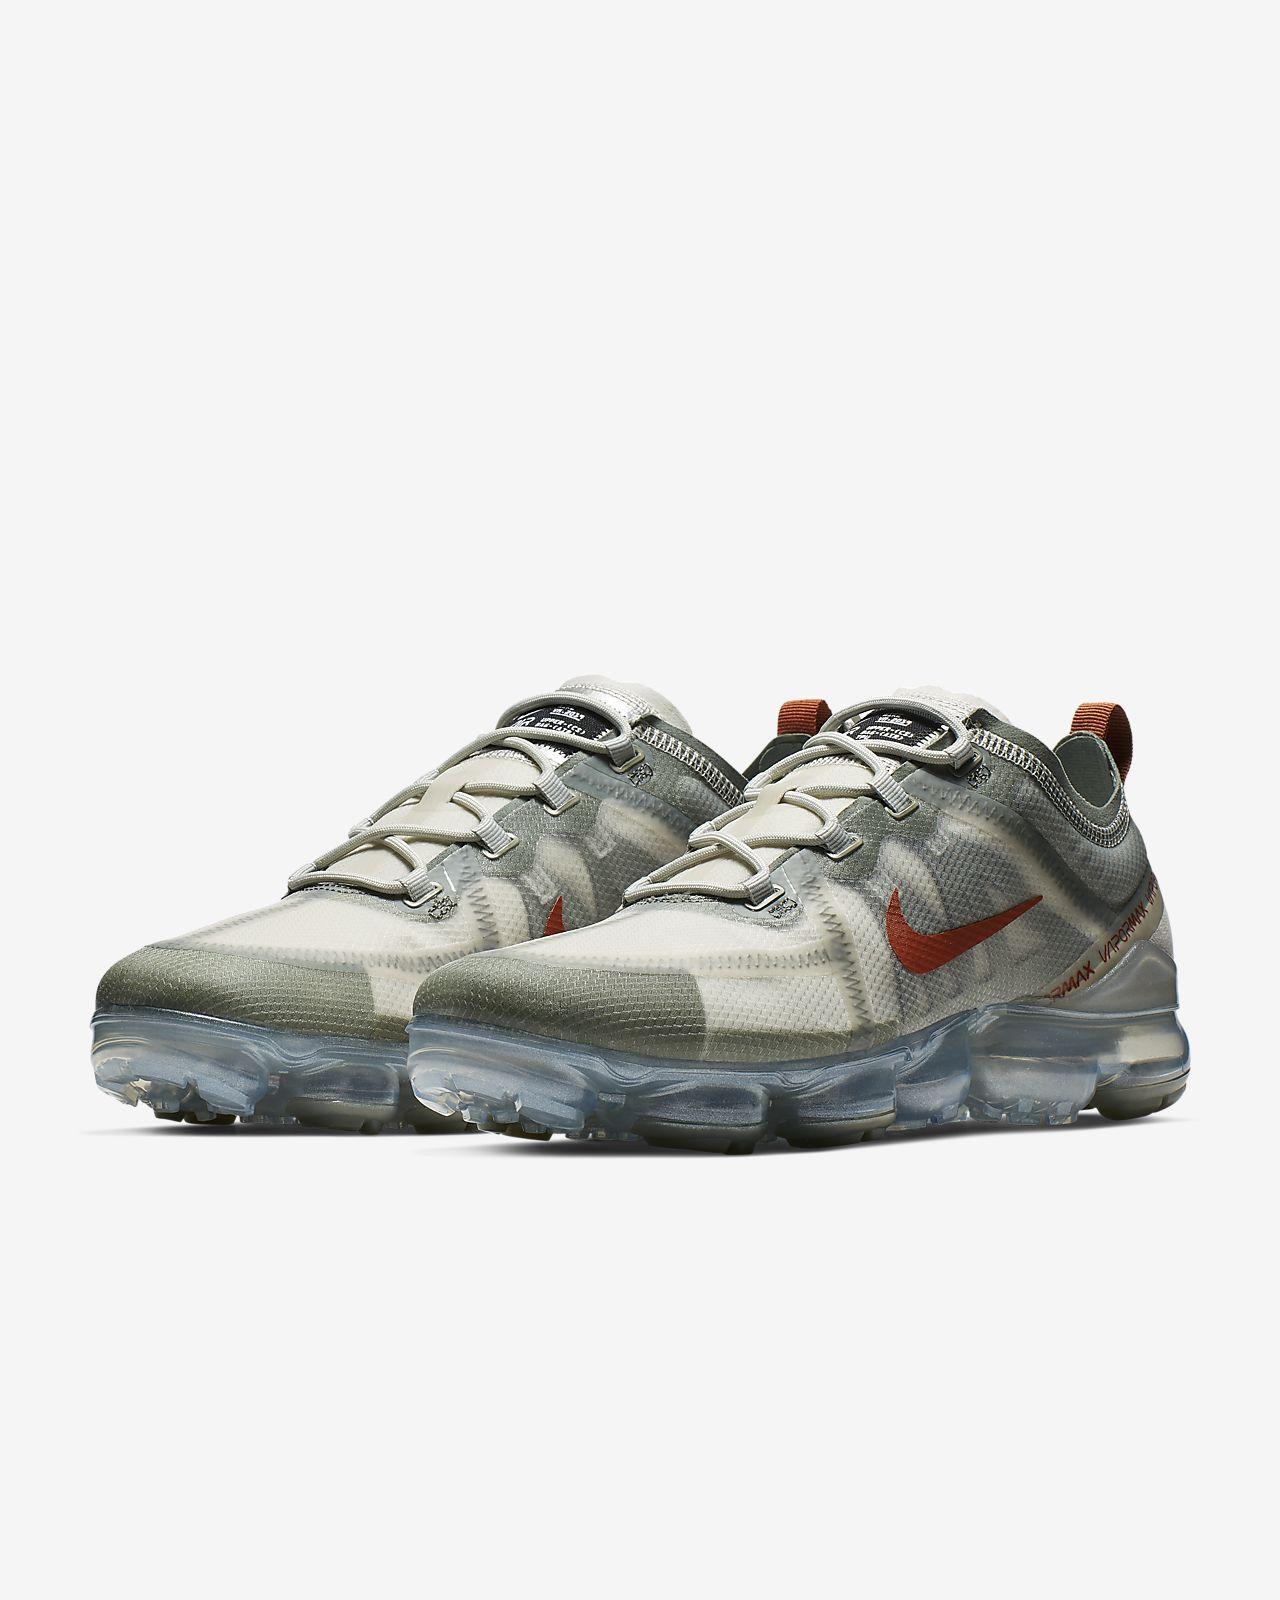 21d156a2809c4 Calzado Nike Air VaporMax 2019. Nike.com MX